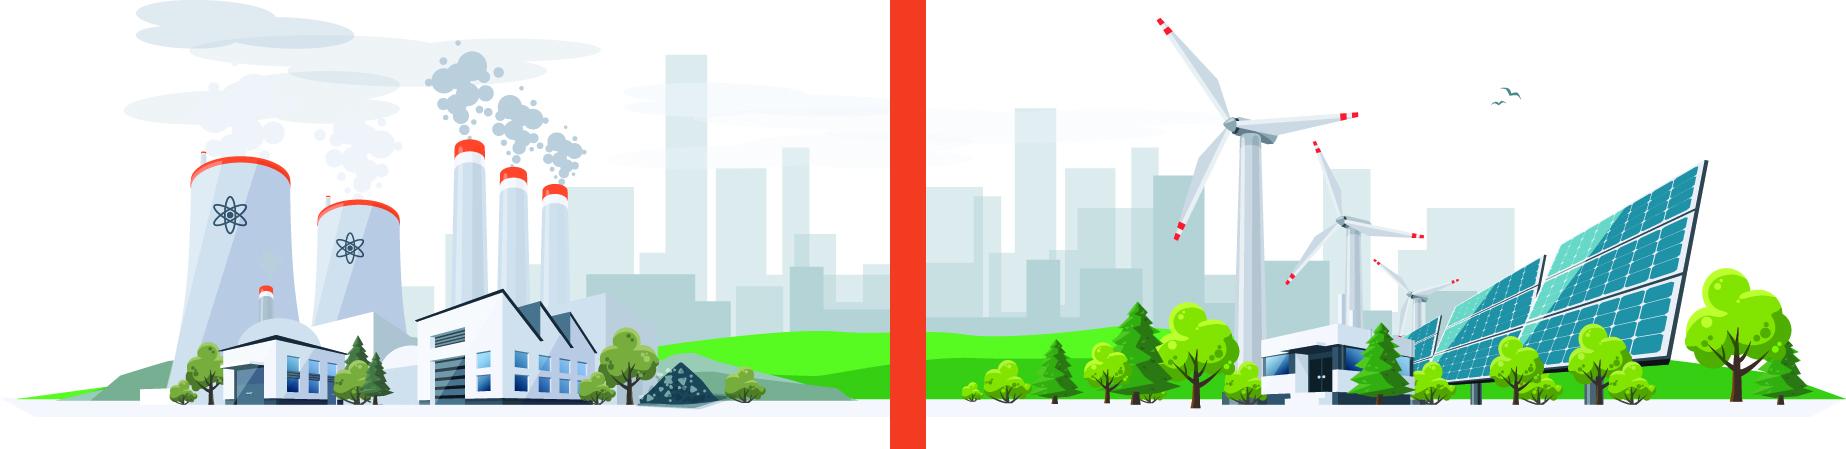 energie fossile versus energie renouvelable